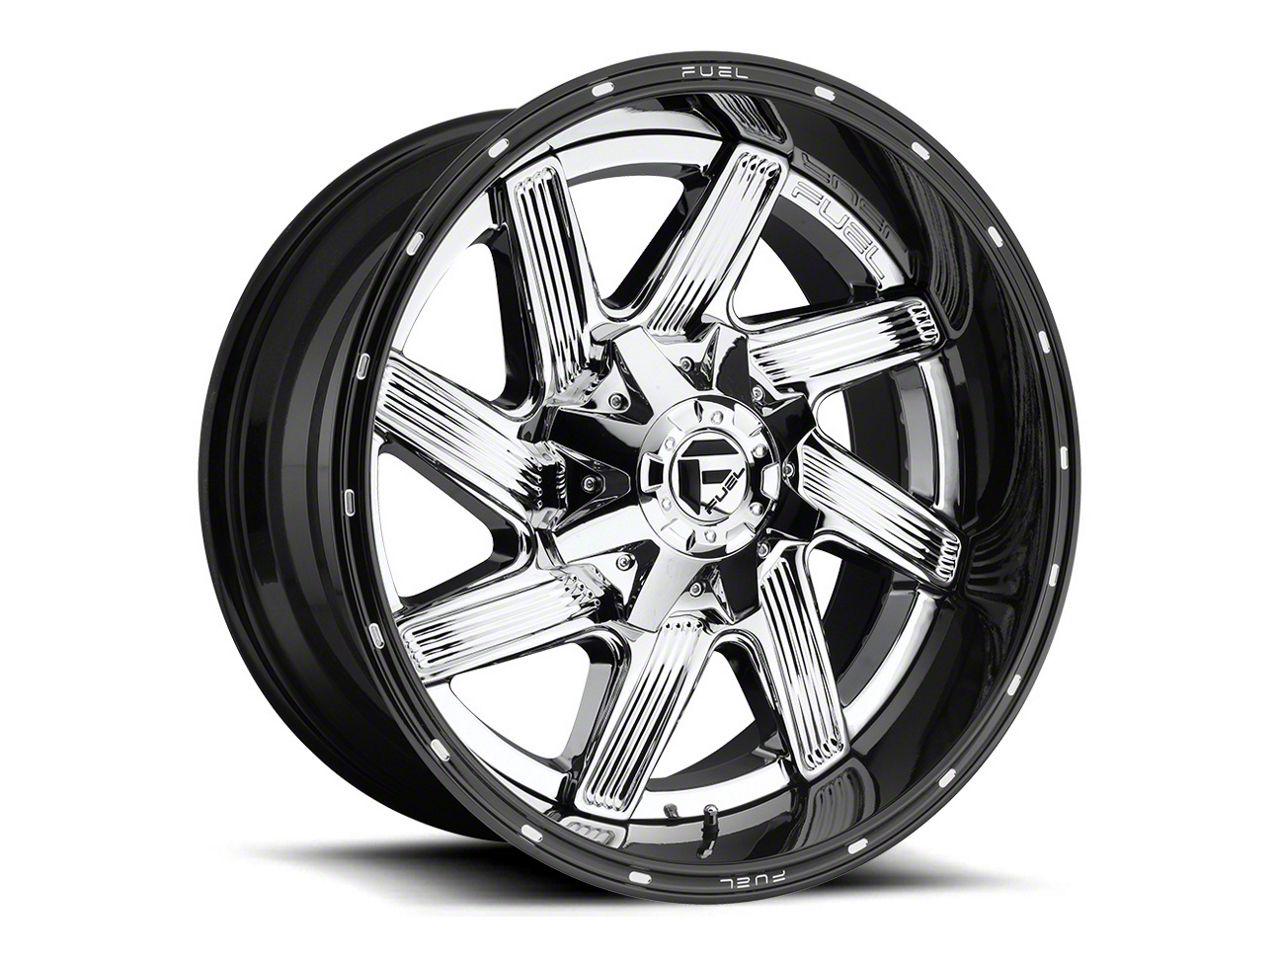 Fuel Wheels Moab Chrome 6-Lug Wheel - 20x14 (07-18 Sierra 1500)